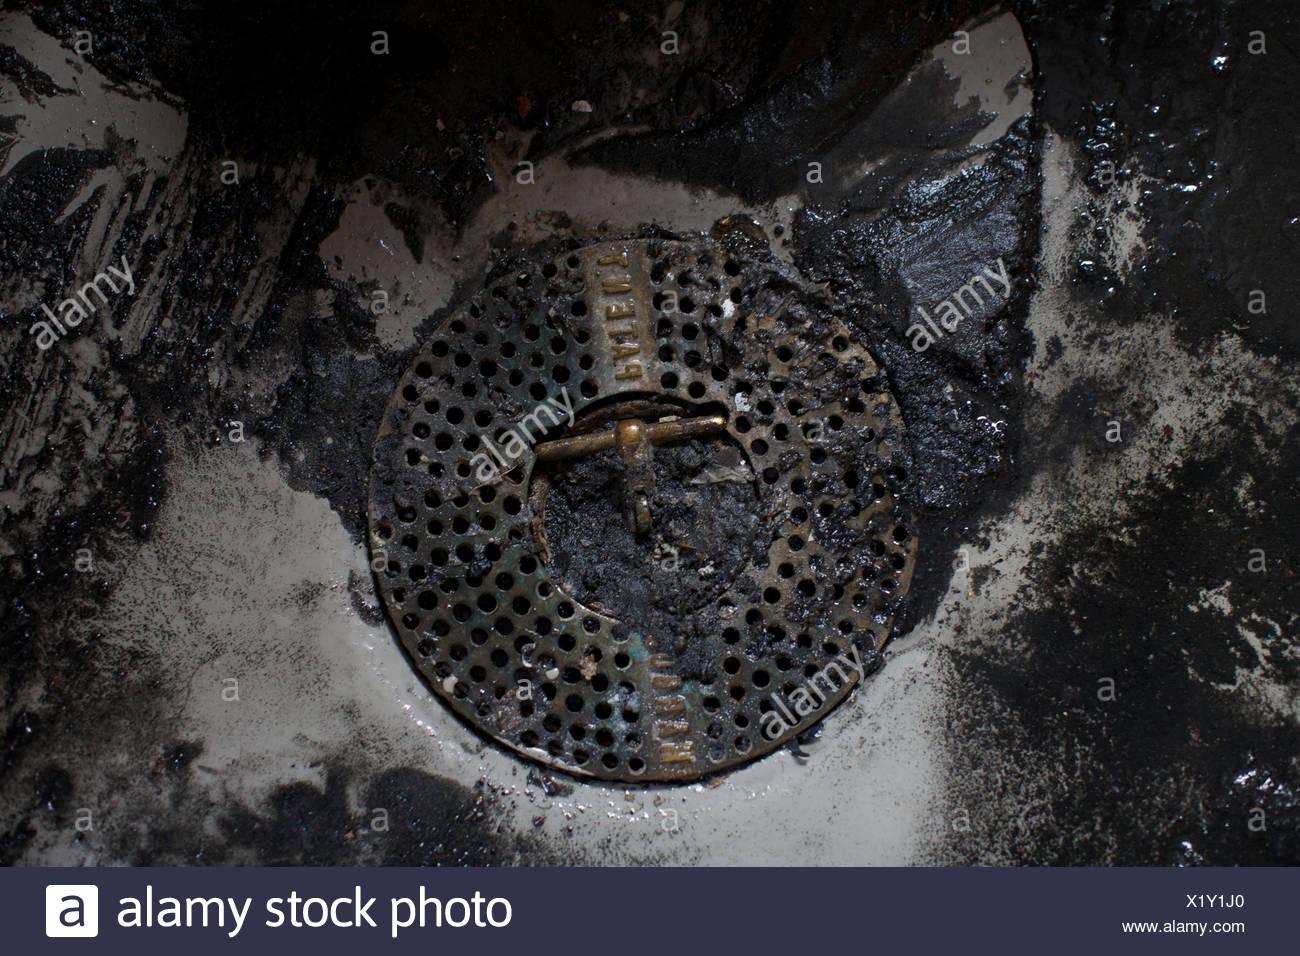 closed sewage lid. unhygienic, cloudburst, messy, manhole. - Stock Image